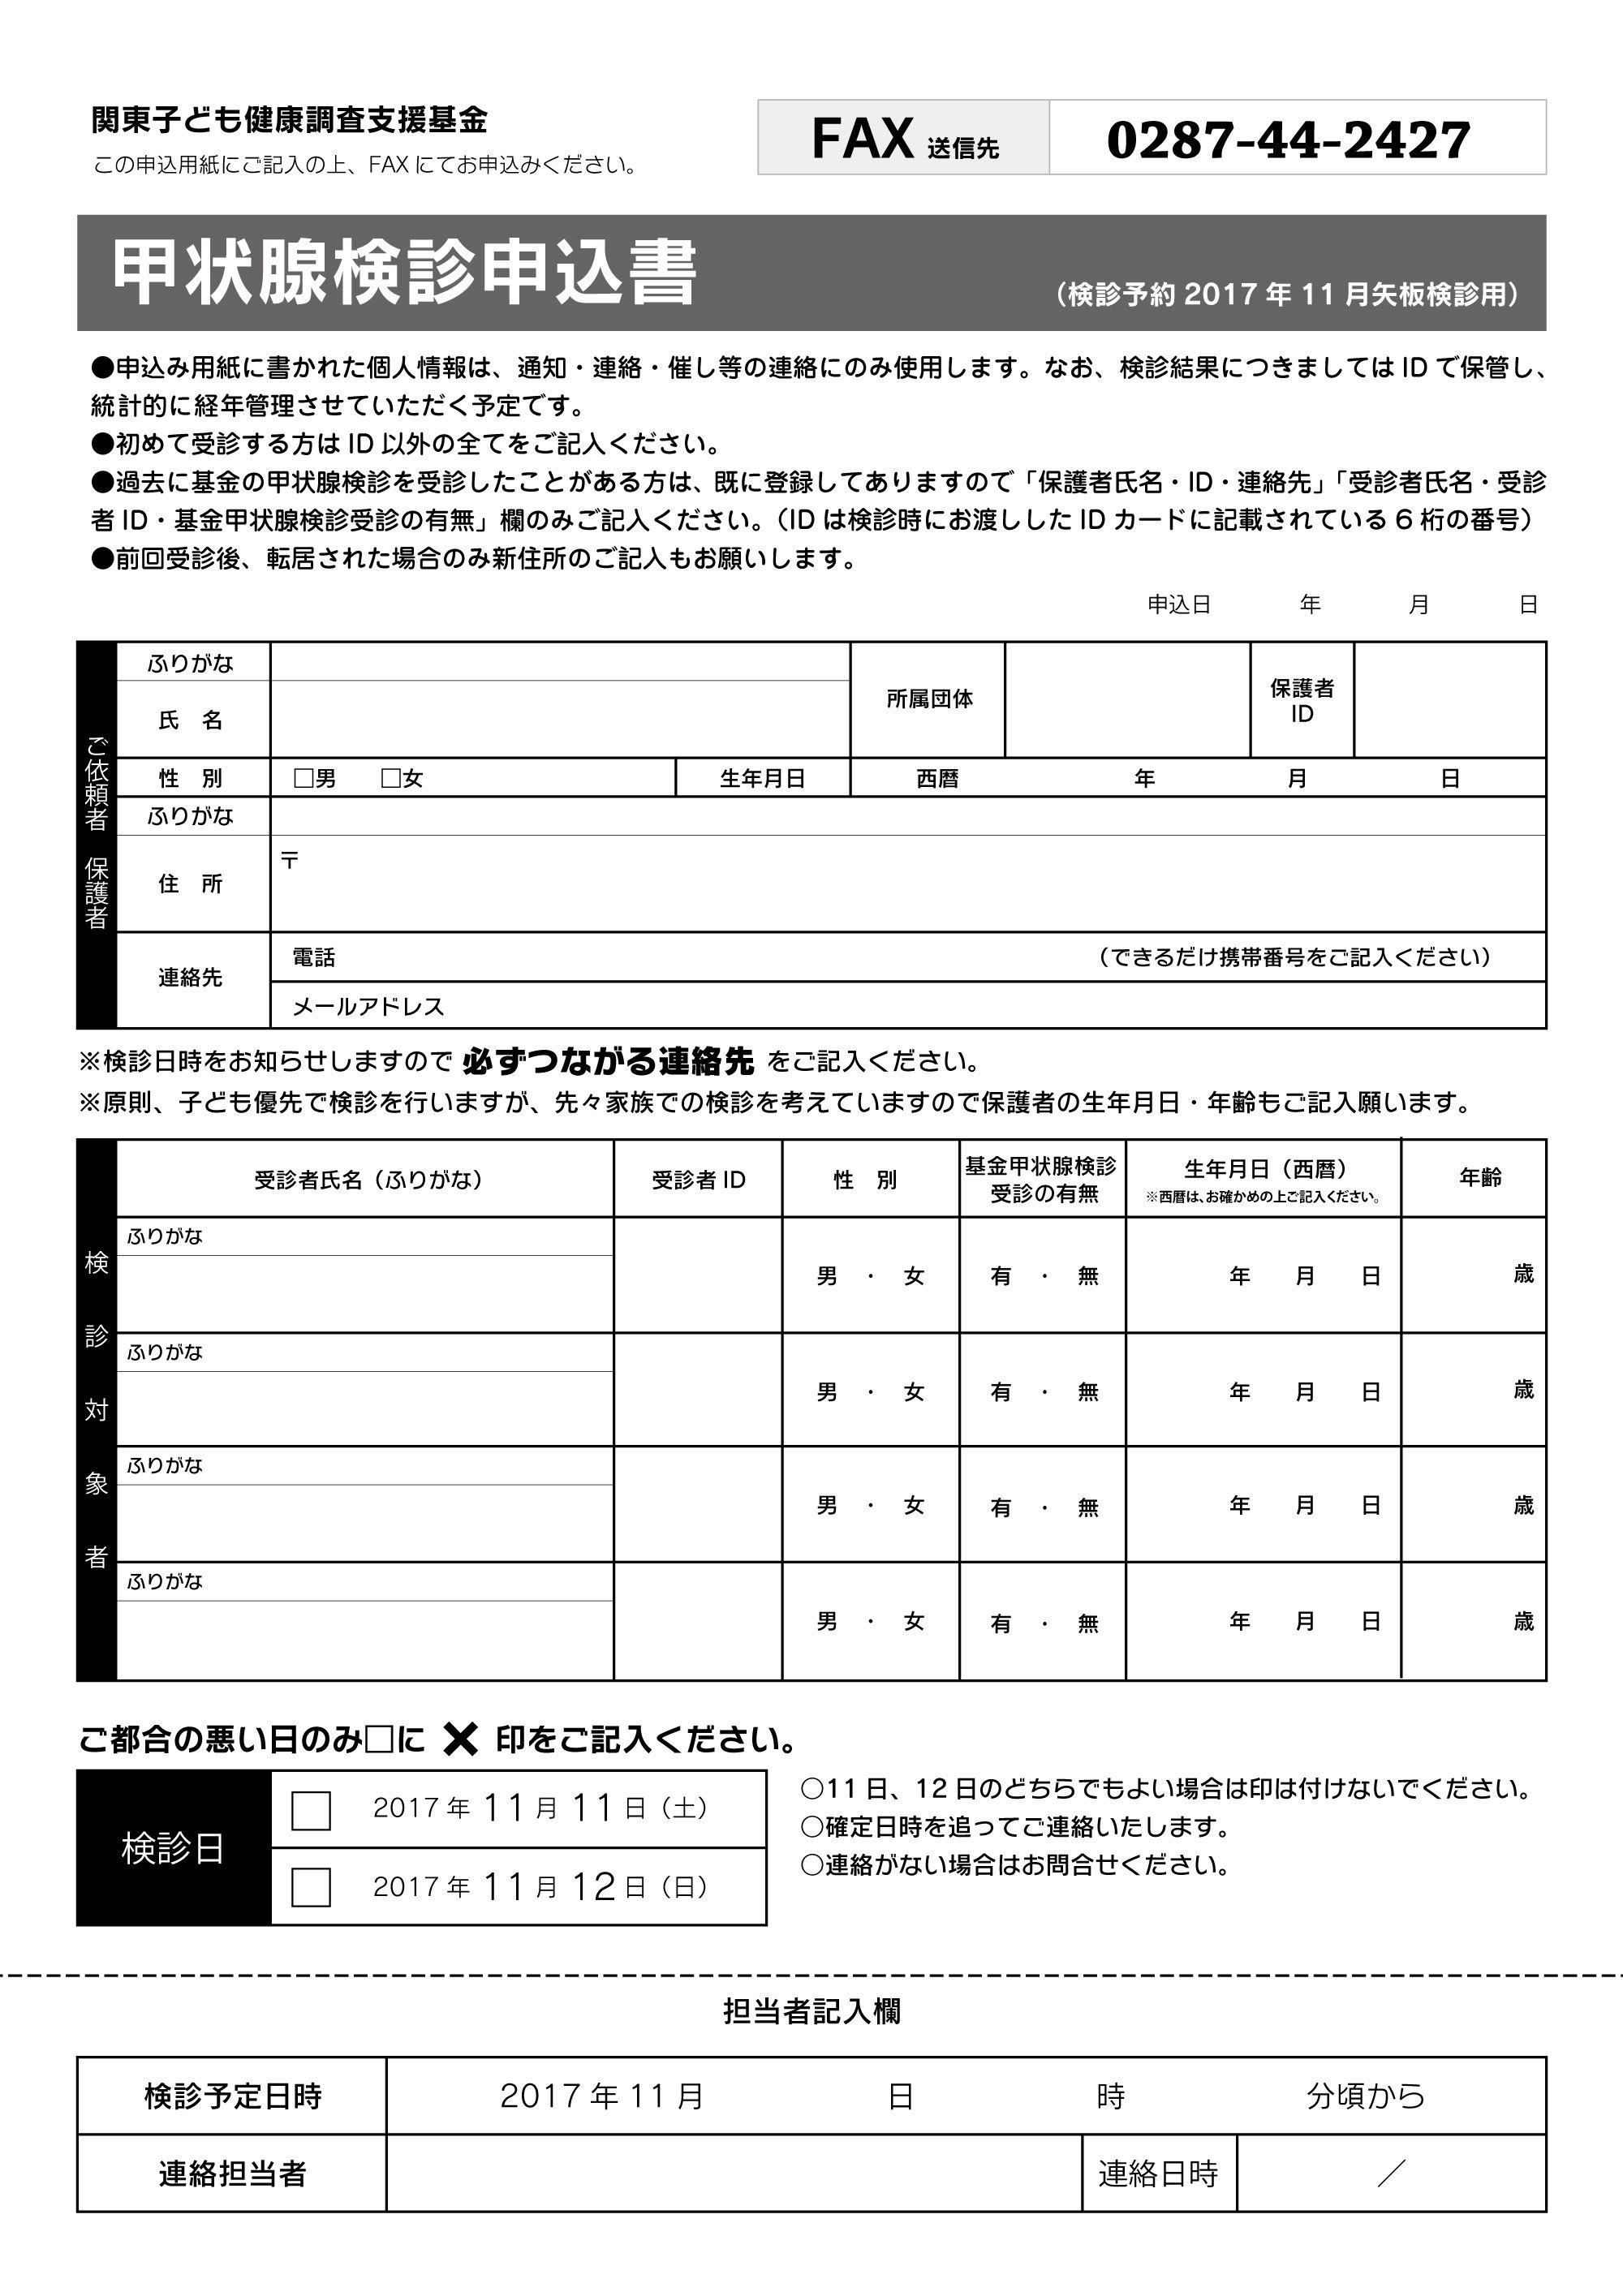 20170801134115fc0.jpg